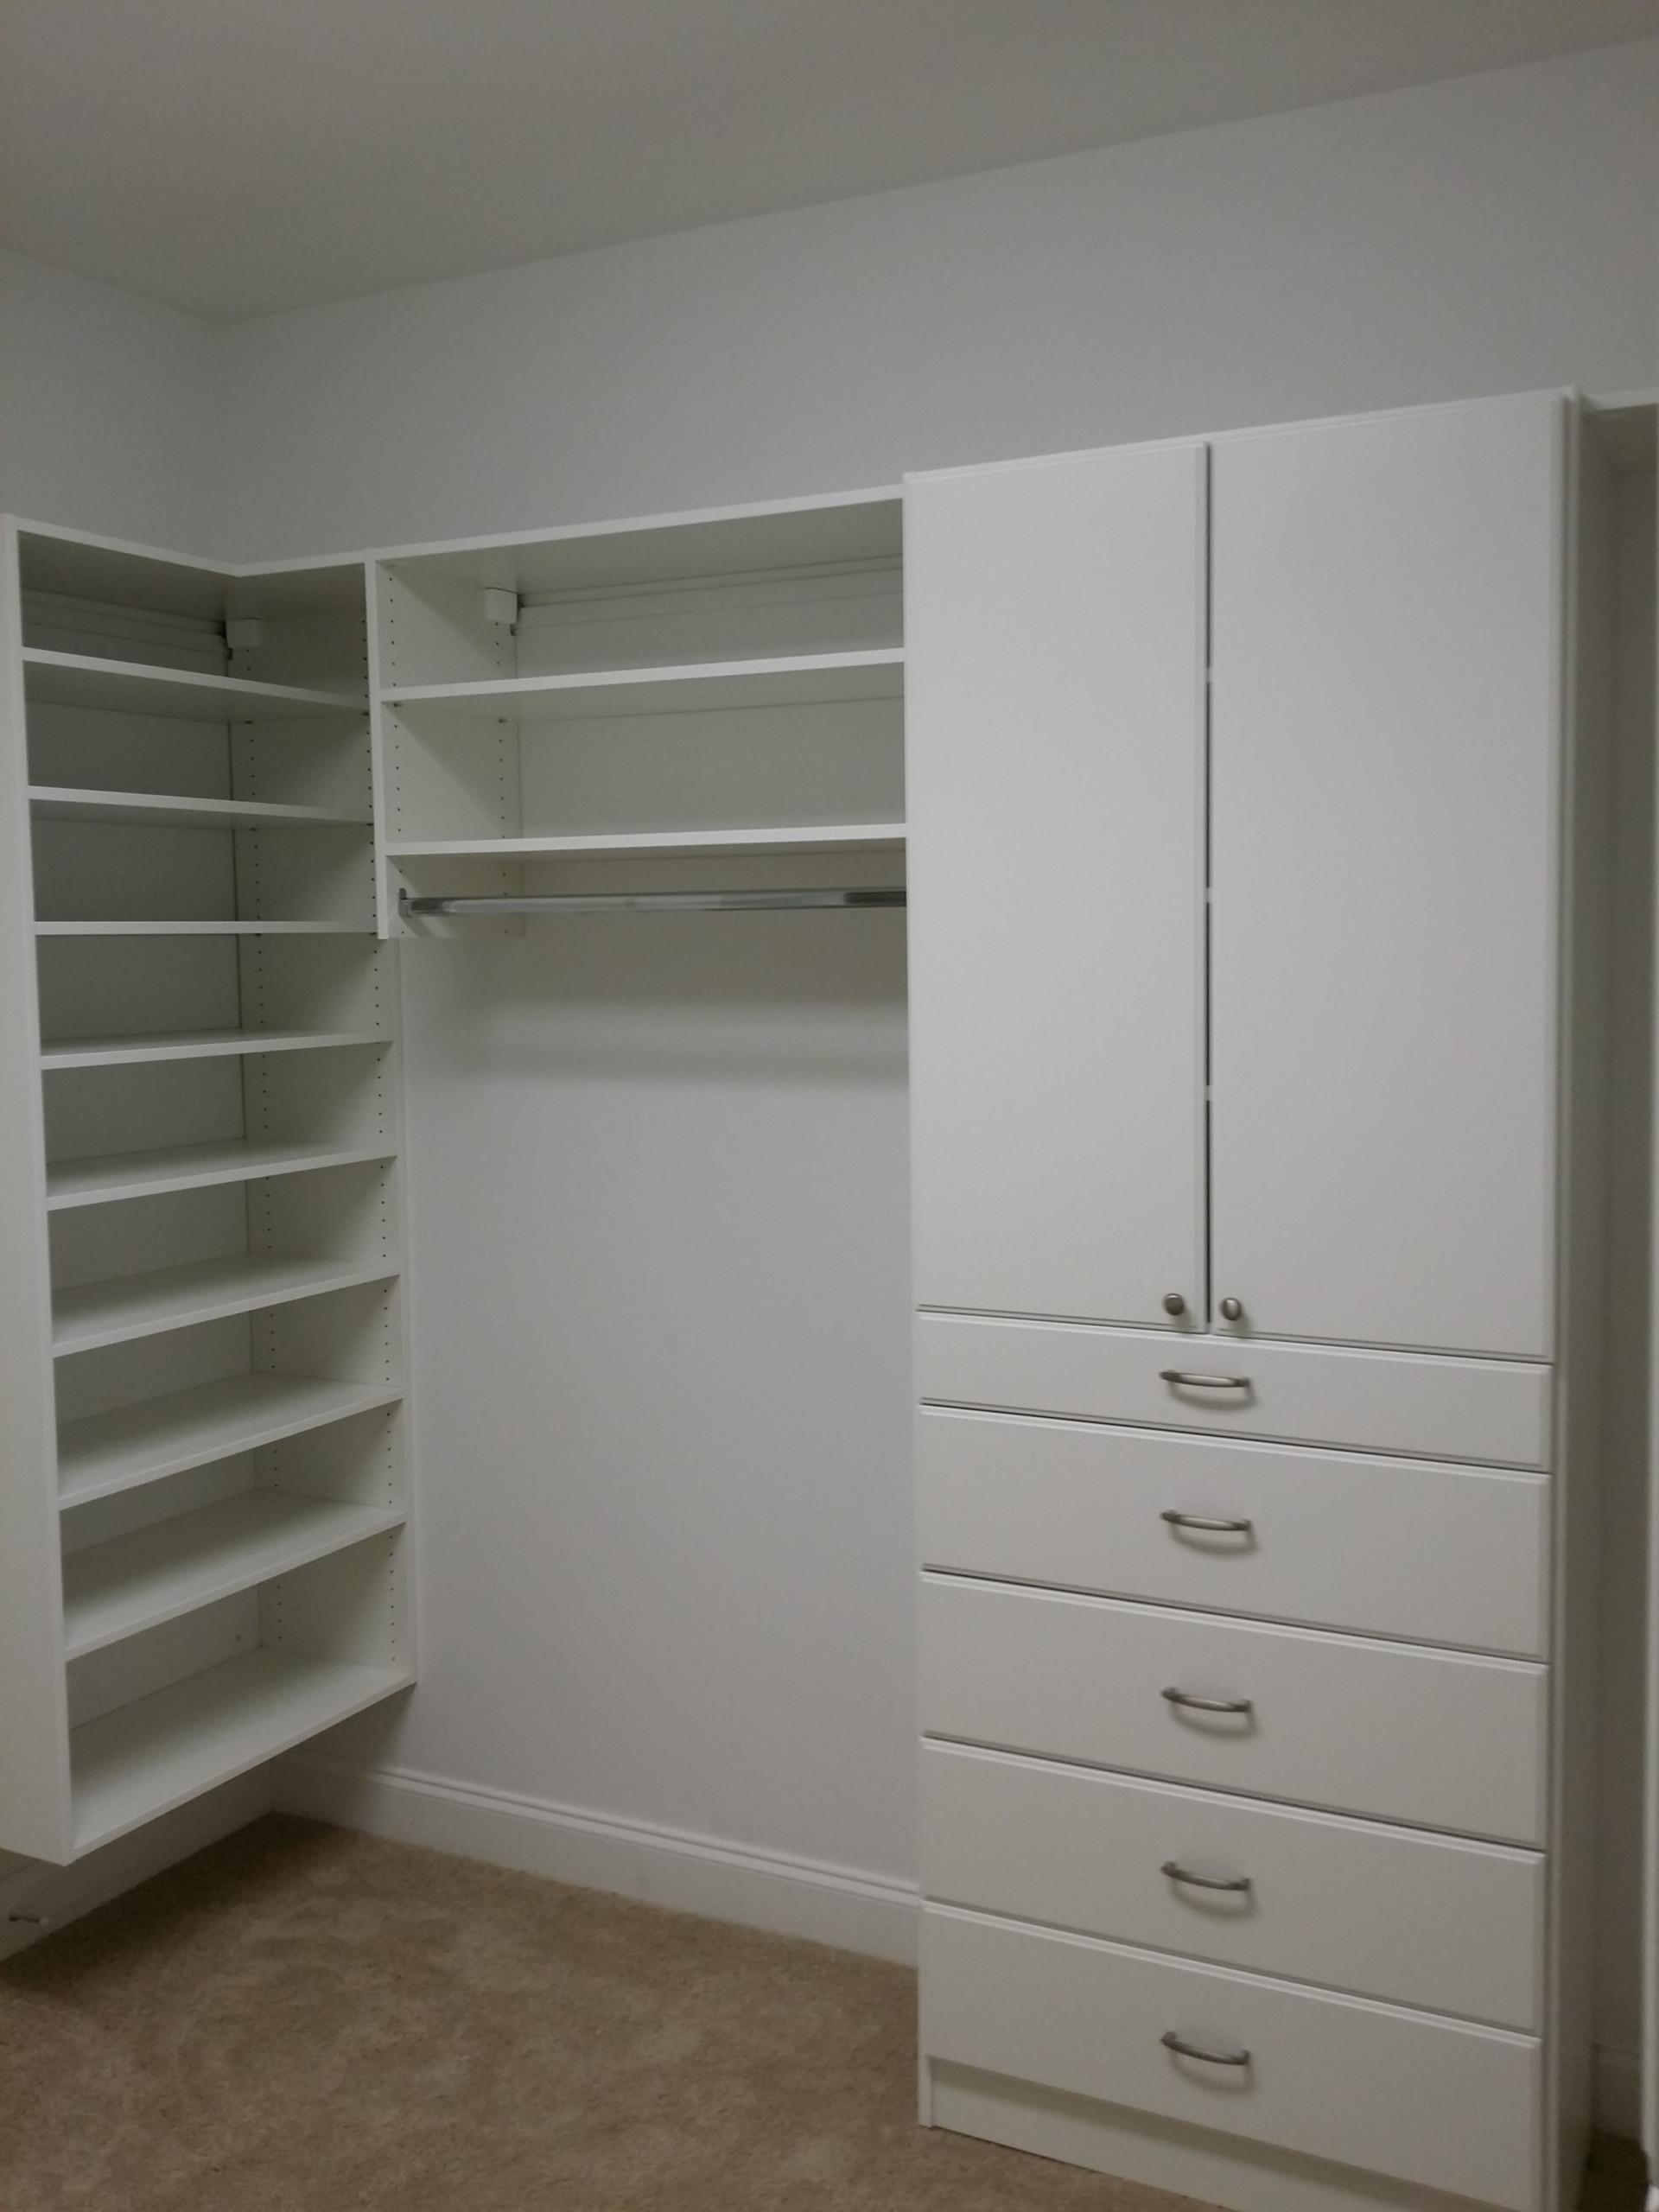 Master Walk-In Closet in Gaffney, SC